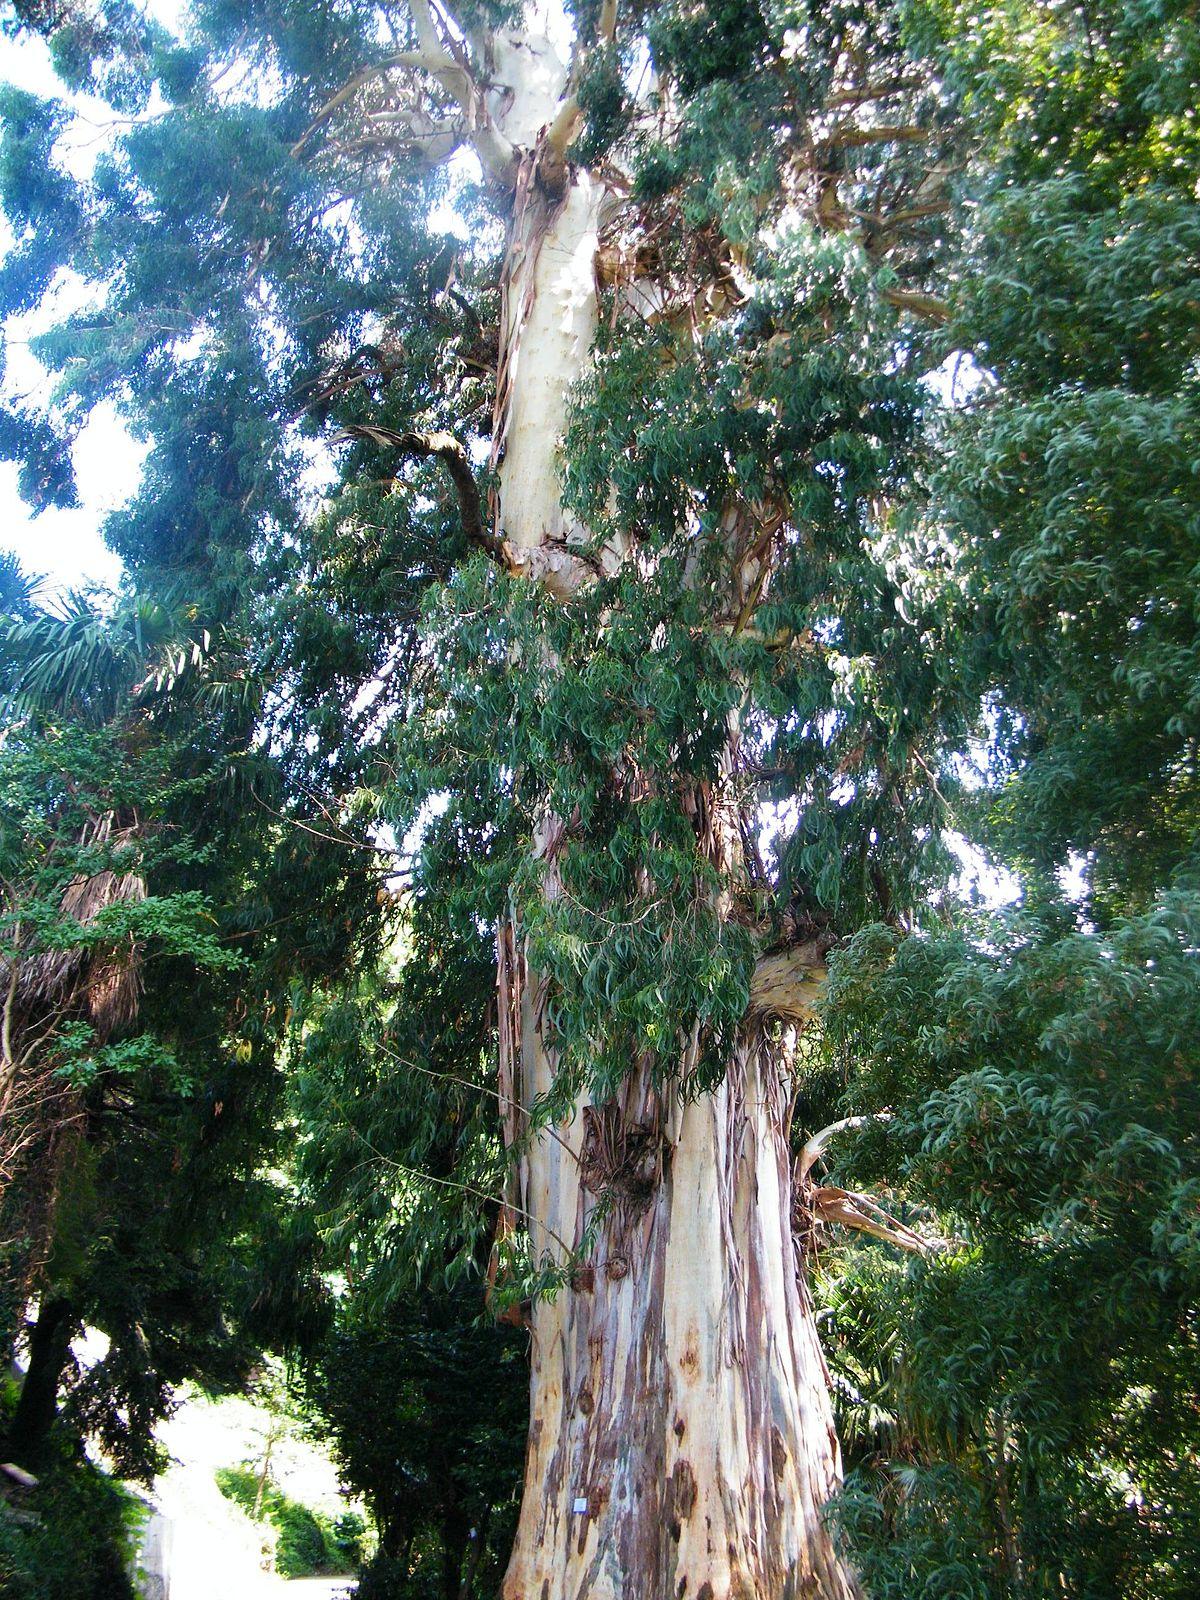 7580 ЕВКАЛІПТА НАСТОЙКА - Eucalyptus vitaminalis**